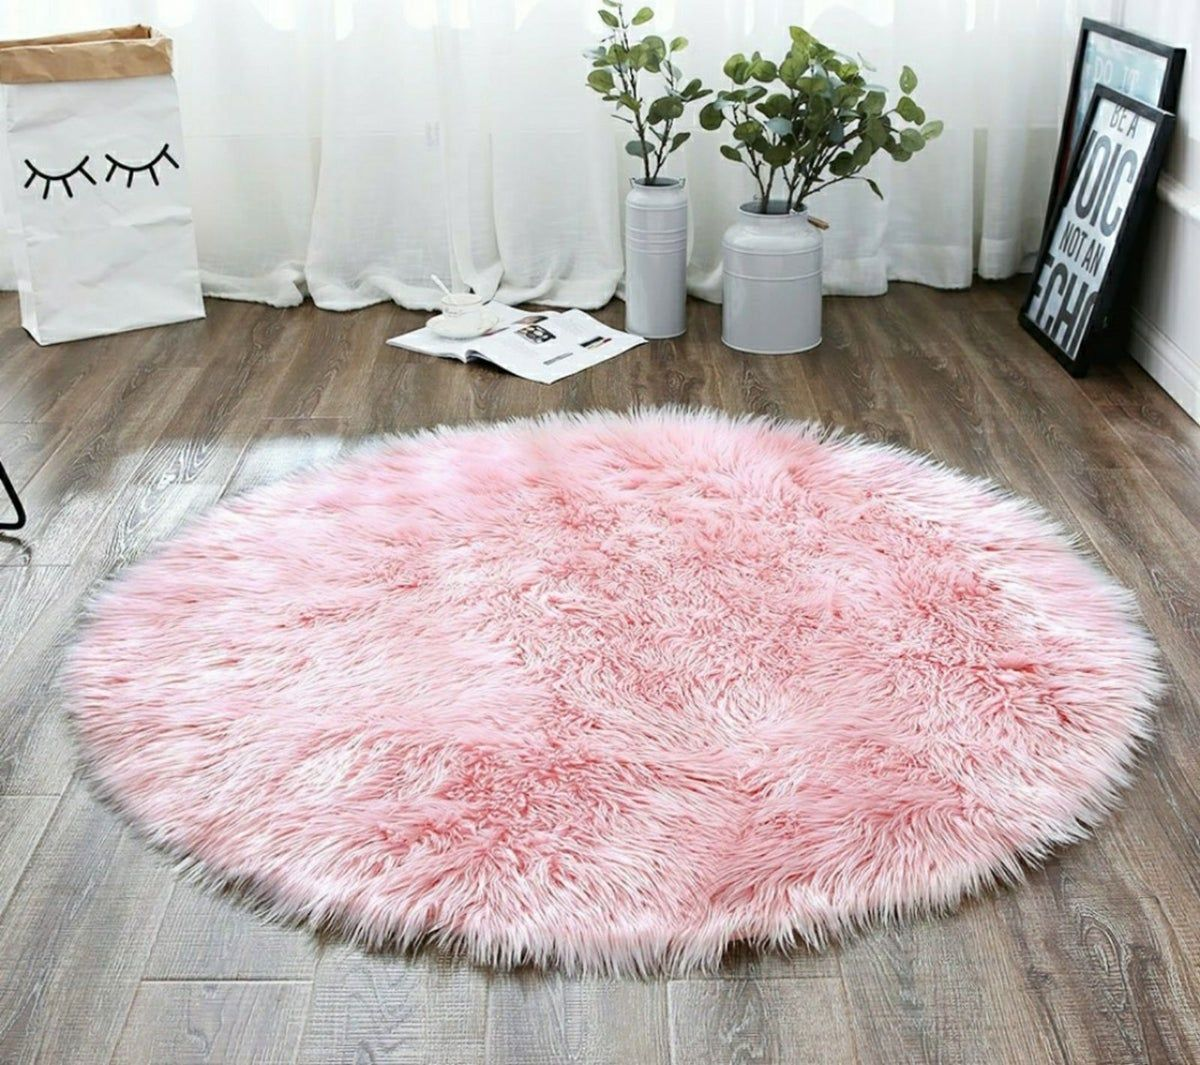 Faux Fur Pink 3 Feet Round Rug Pink Fur Rug Rugs Round Rugs